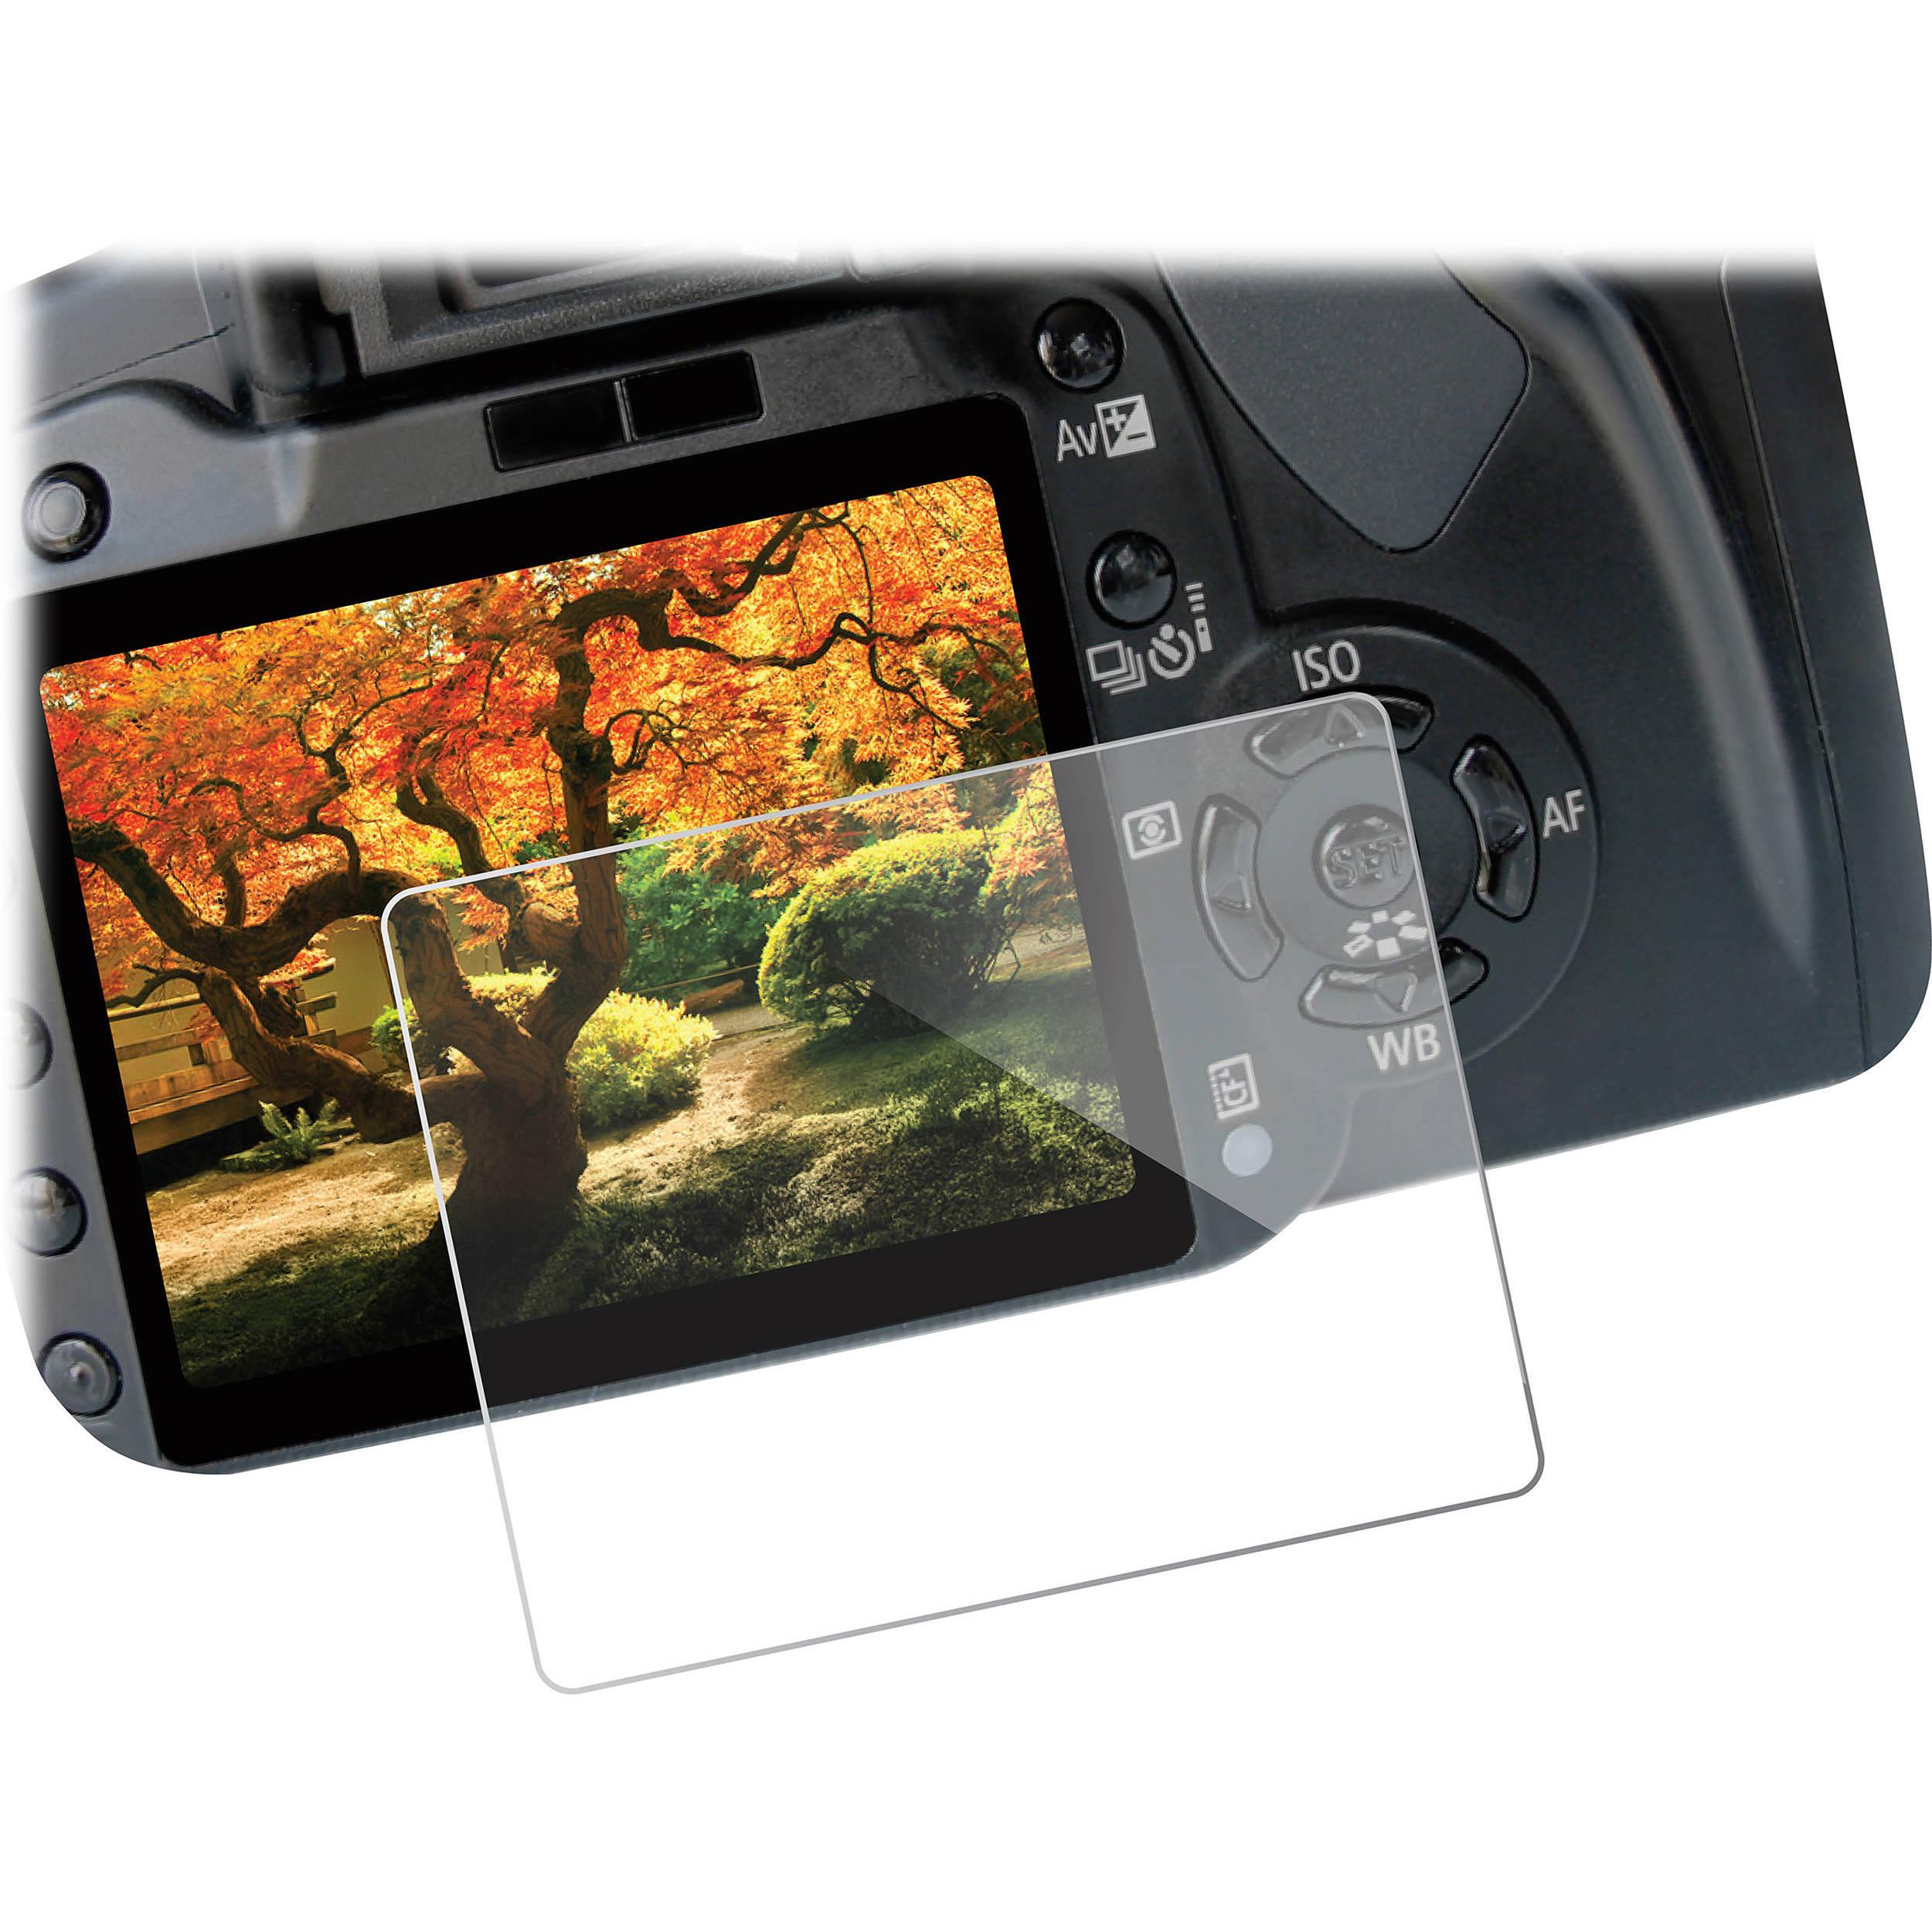 Экран для фотоаппарата canon своими руками